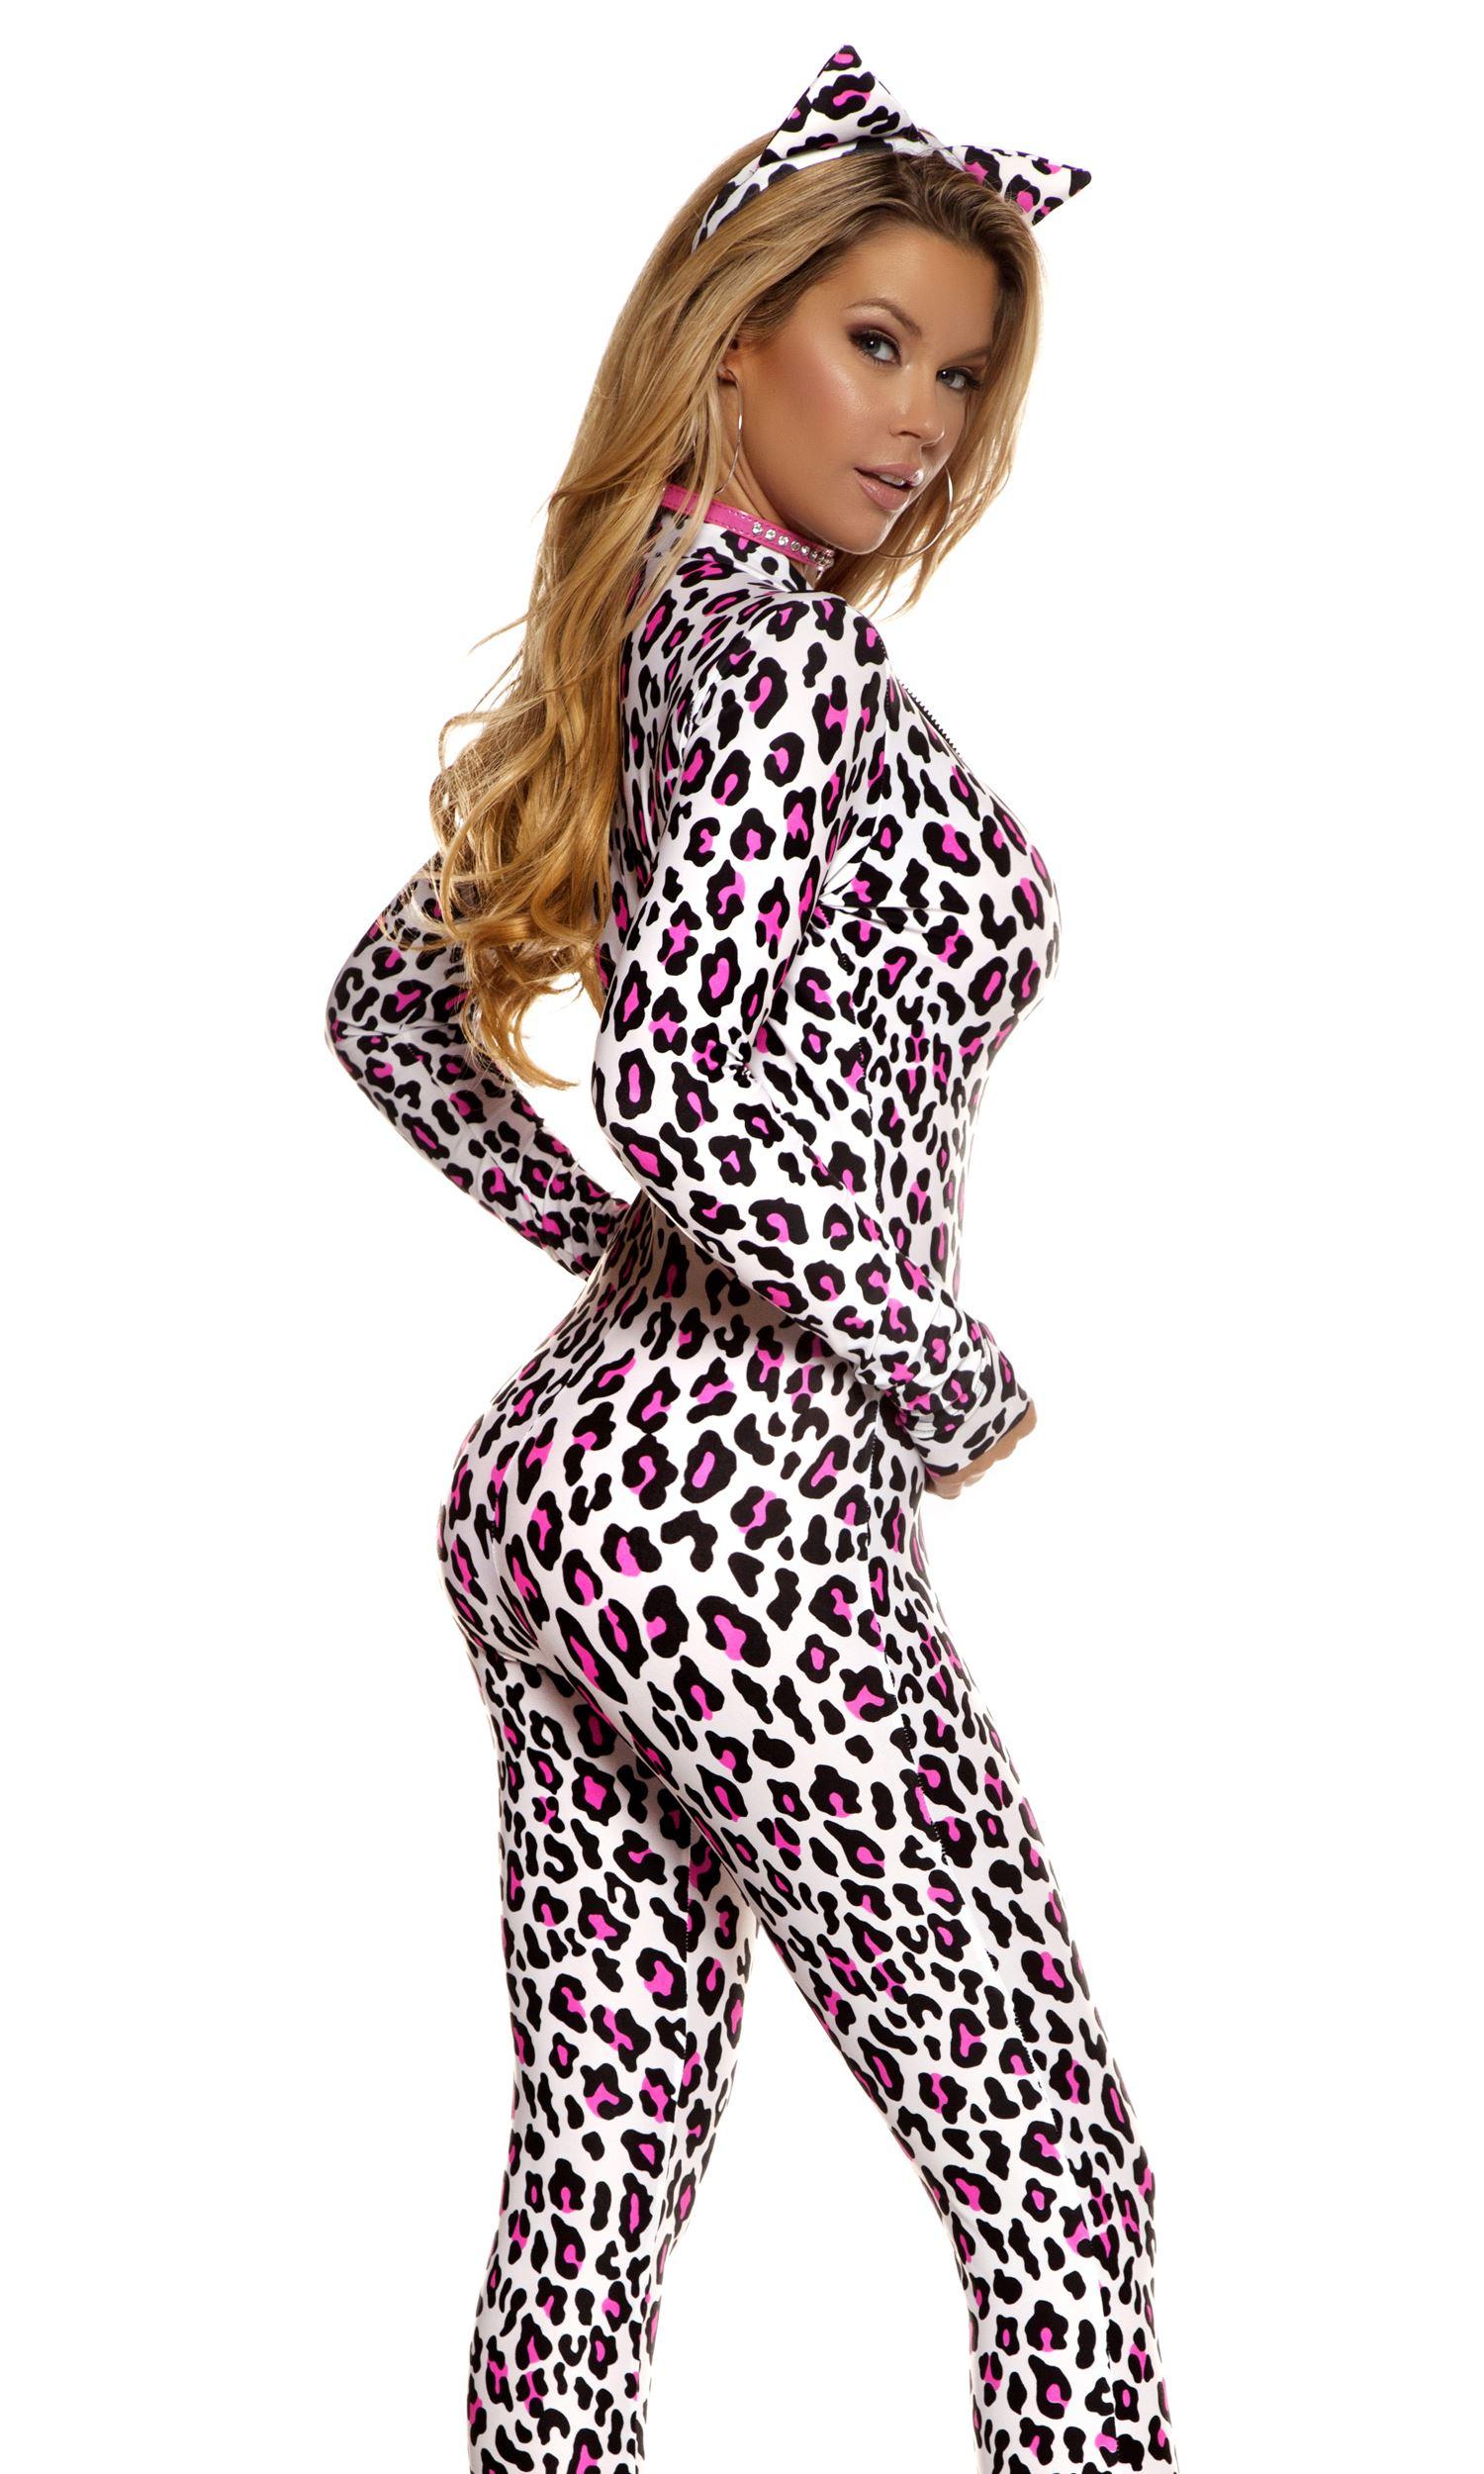 ... Adult Foxy Feline Women Sexy Cat Costume  sc 1 st  The Costume Land & Adult Foxy Feline Women Sexy Cat Costume | $59.99 | The Costume Land